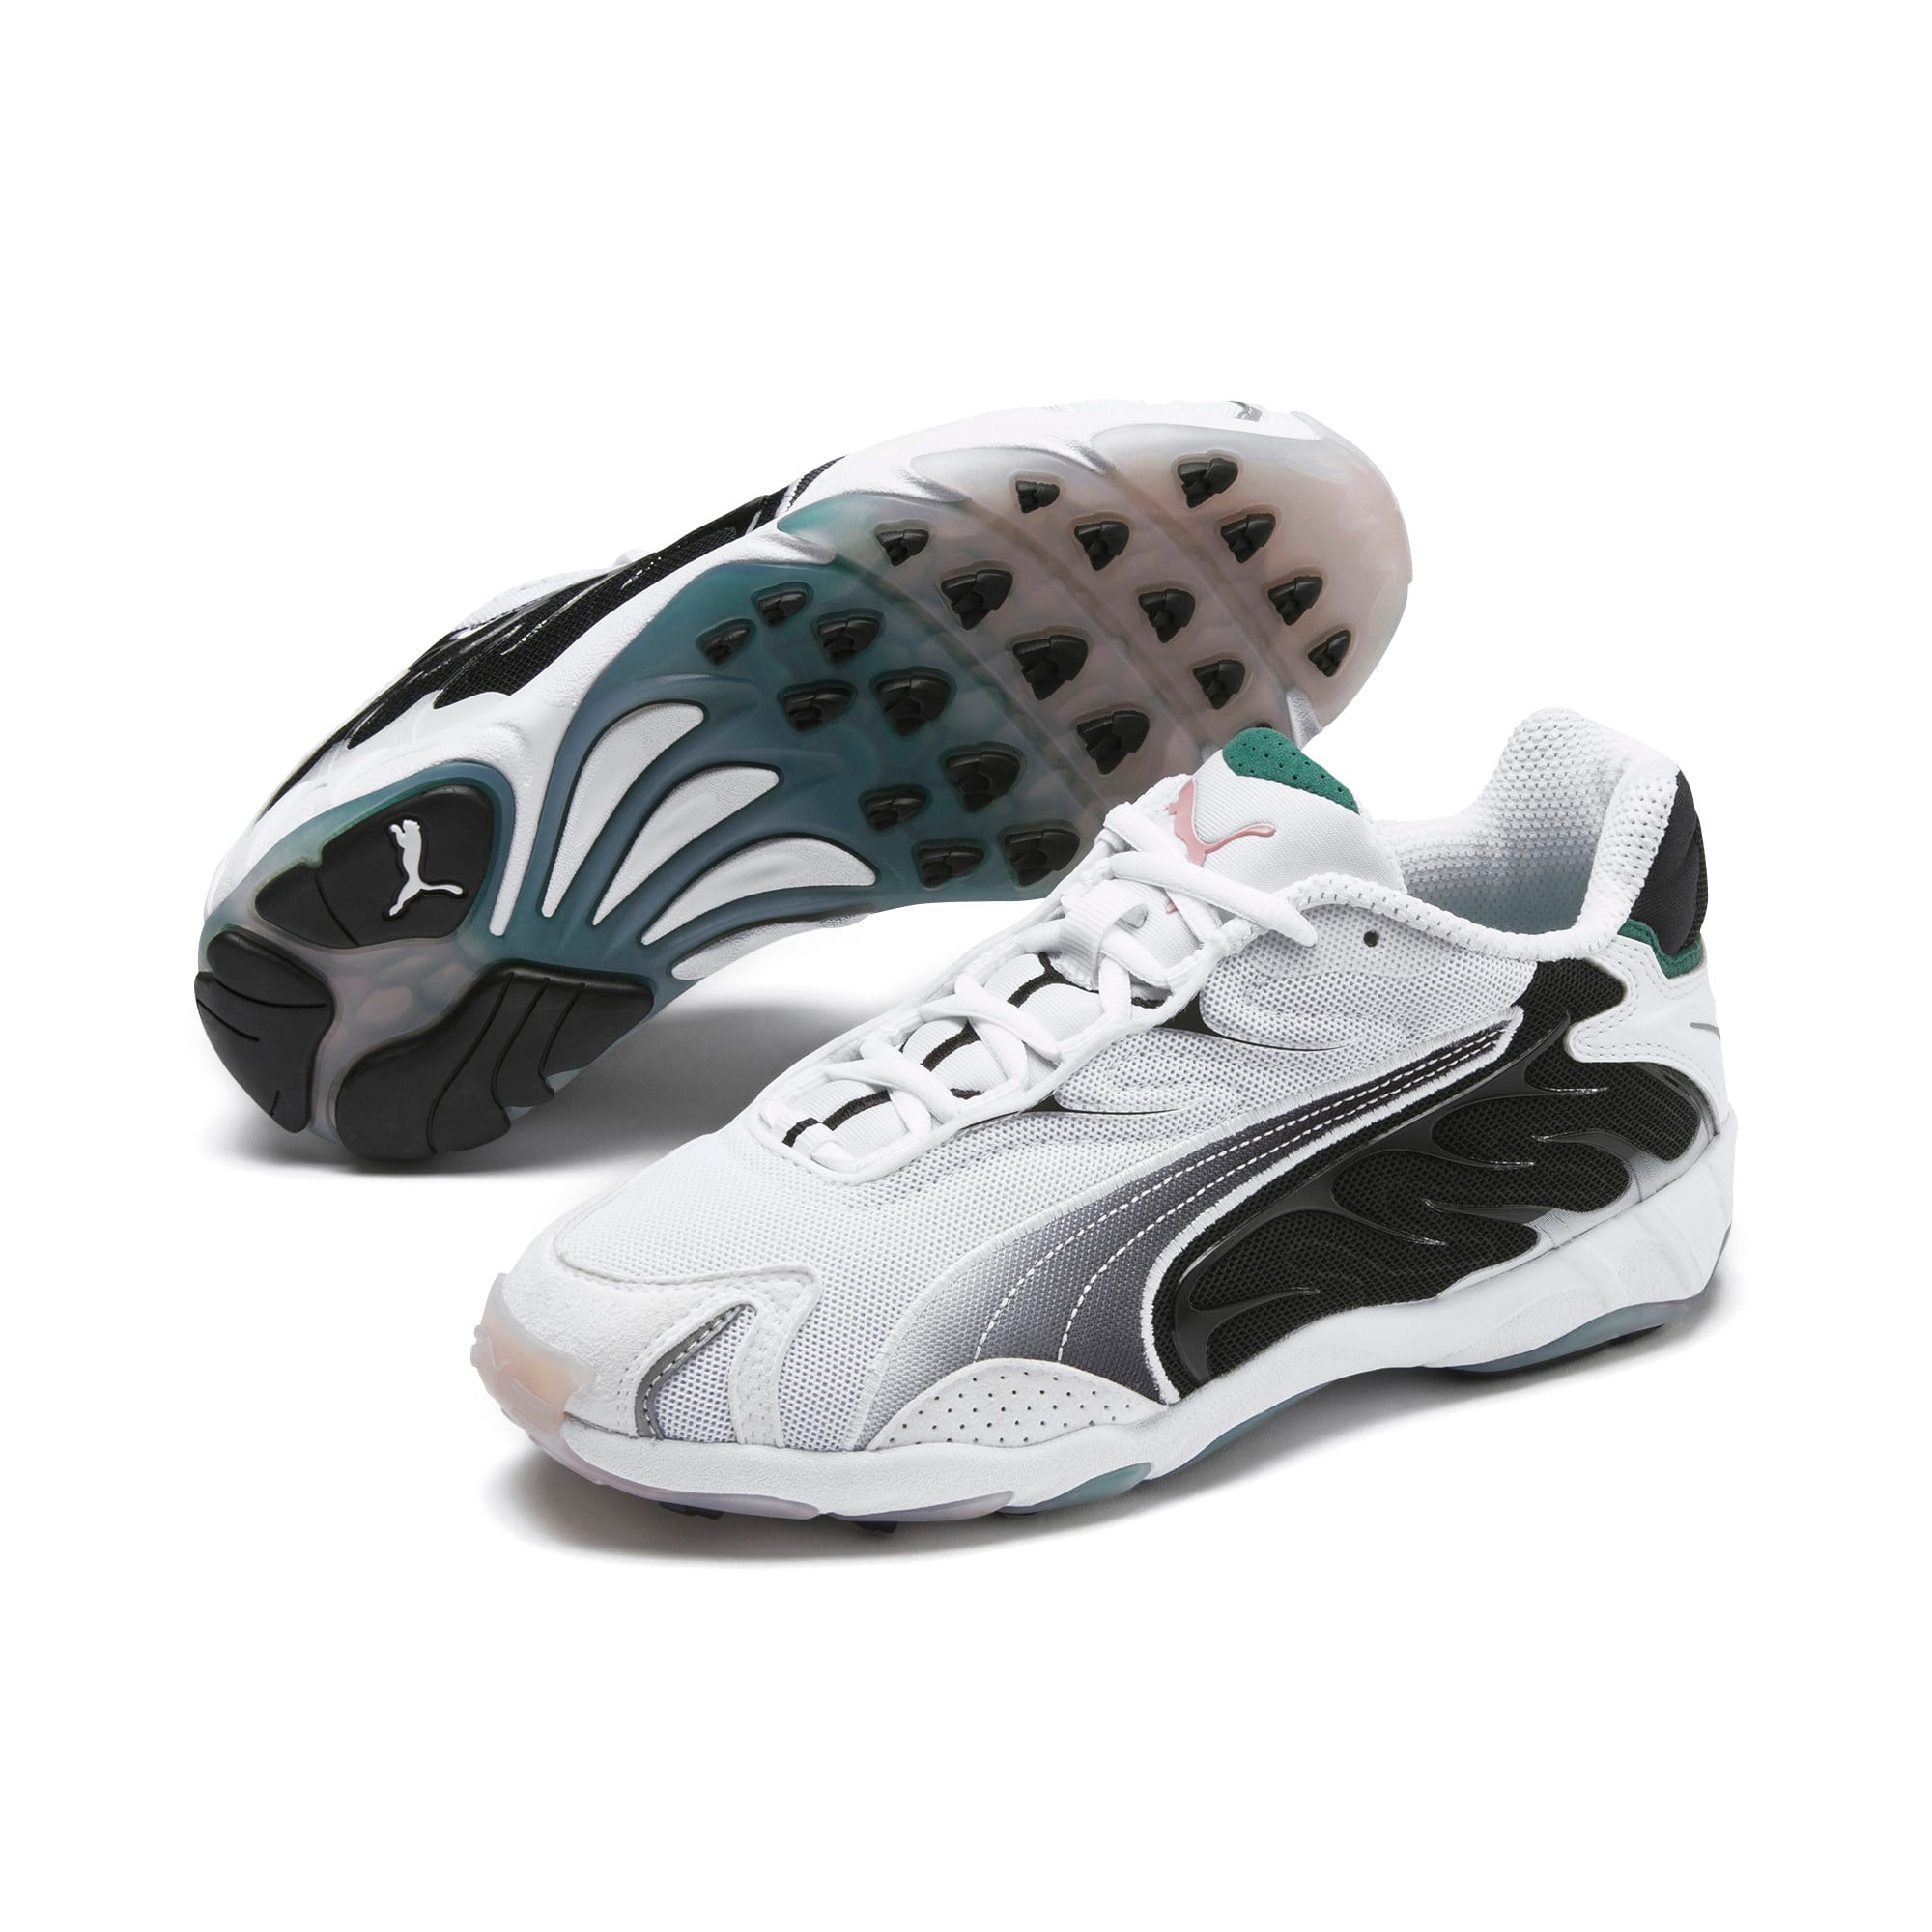 Thumbnail 3 of Inhale Flares Trainers, Puma White-Puma Black, medium